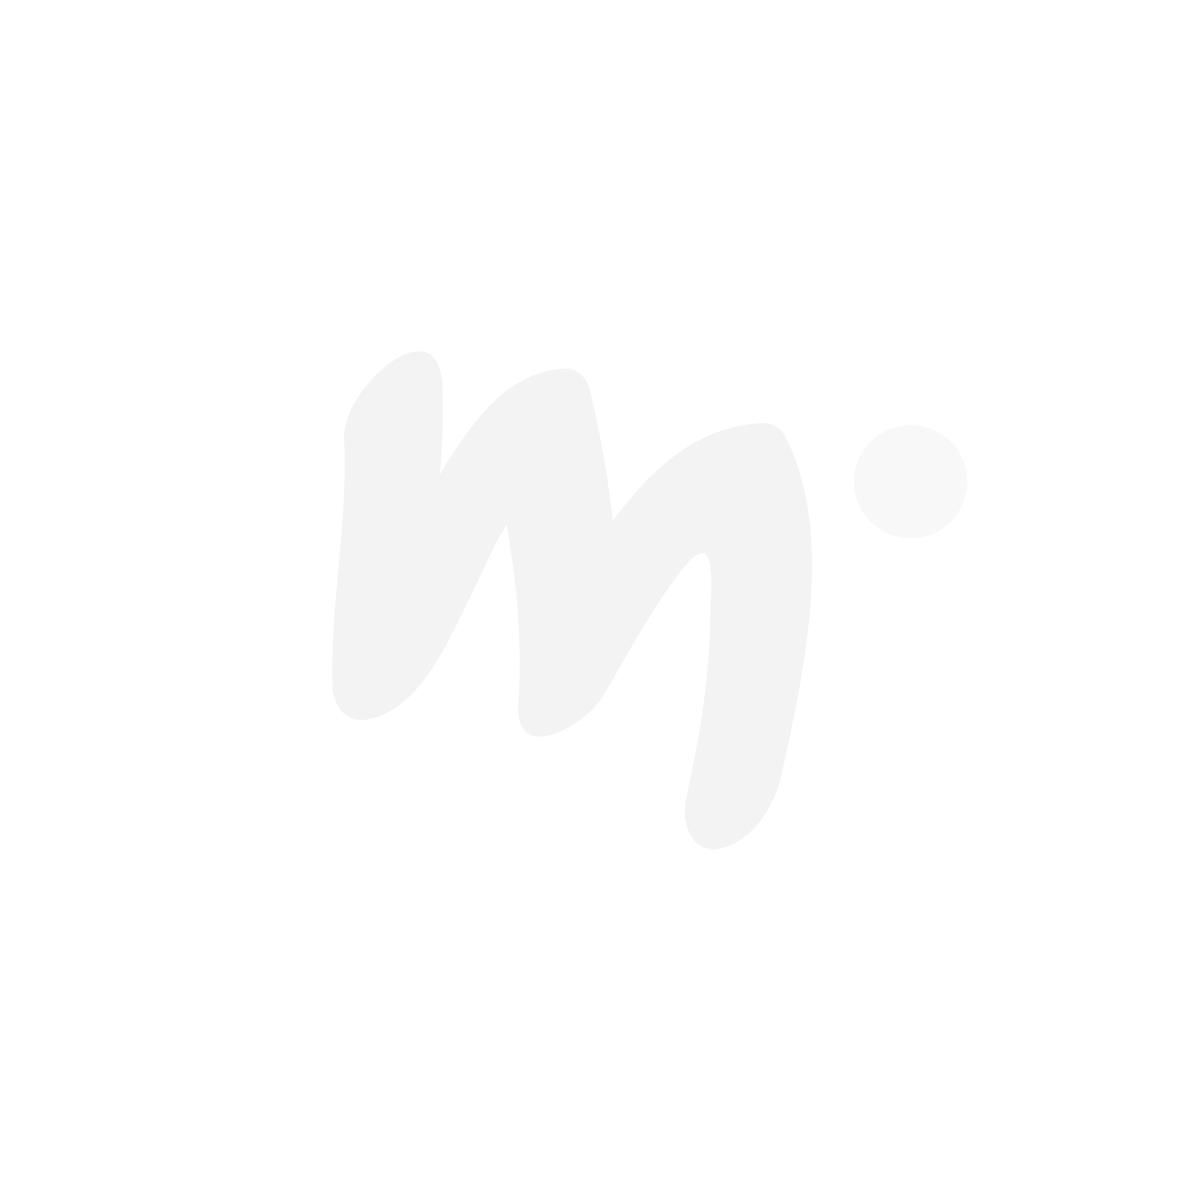 Muumi Muumipapan kuplispiippu